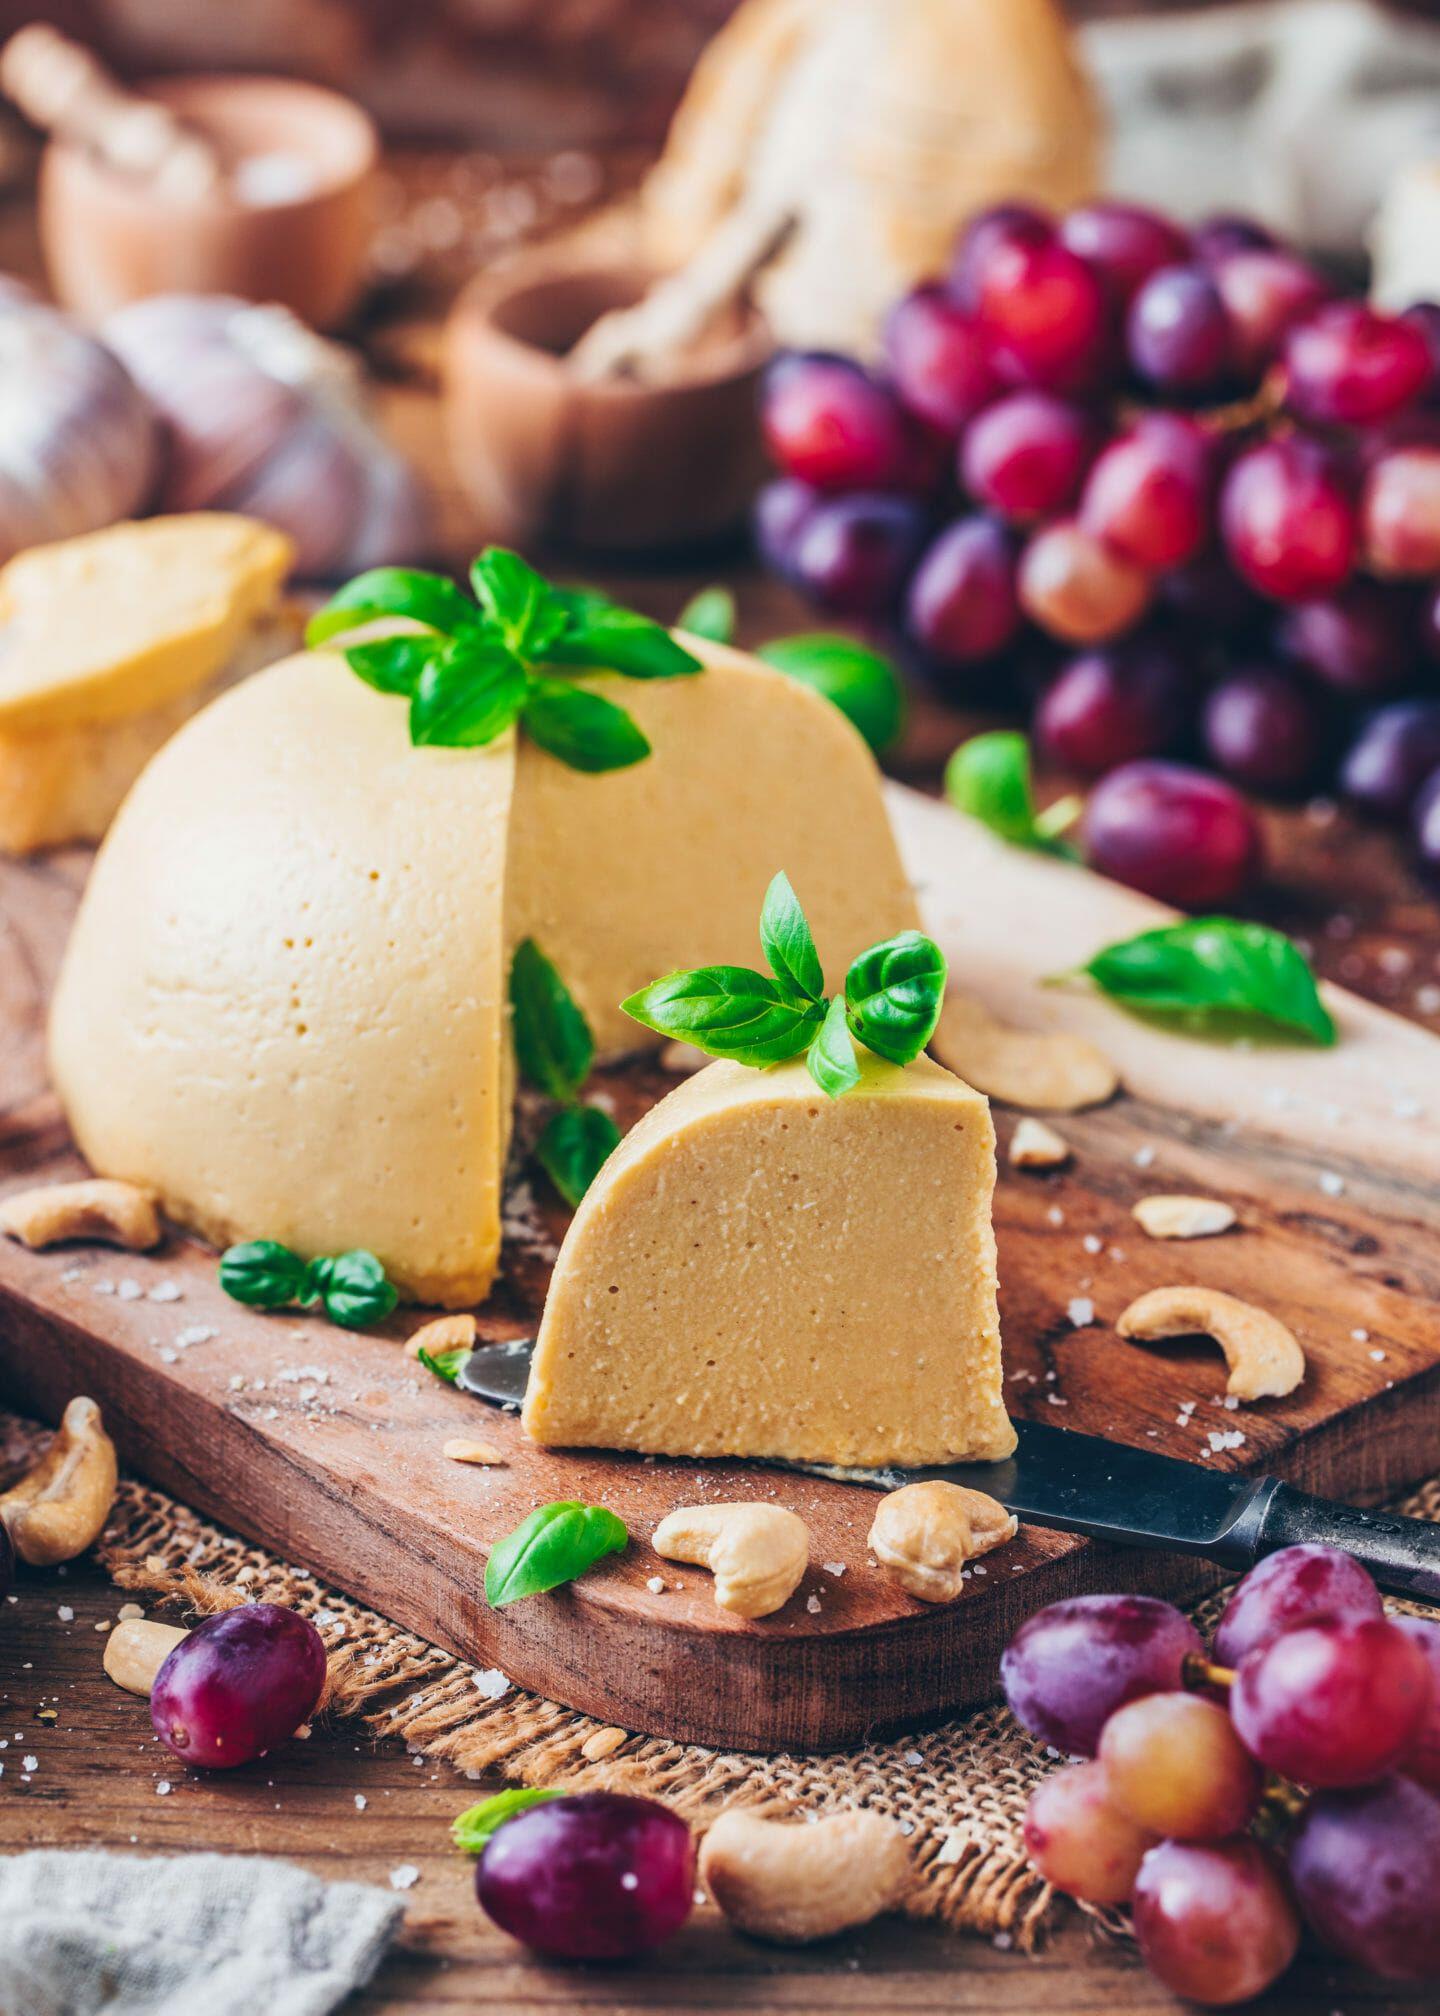 Easy vegan cheese recipe sliceable cashew cheese